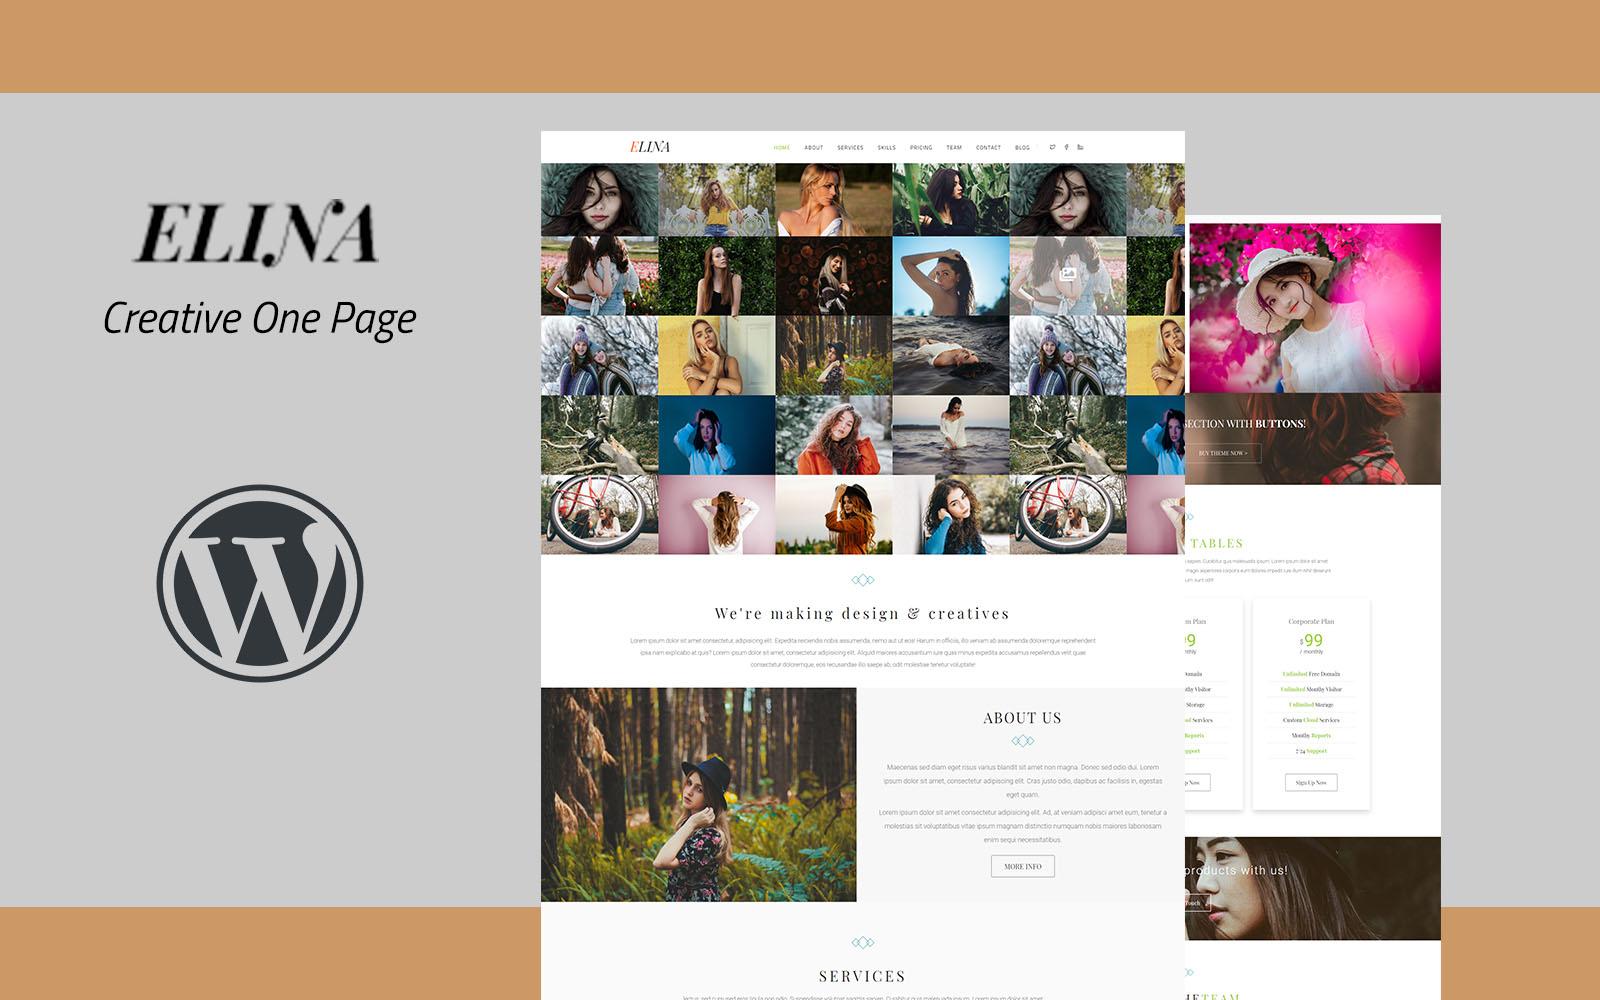 Elina - Creative One Page WordPress Theme